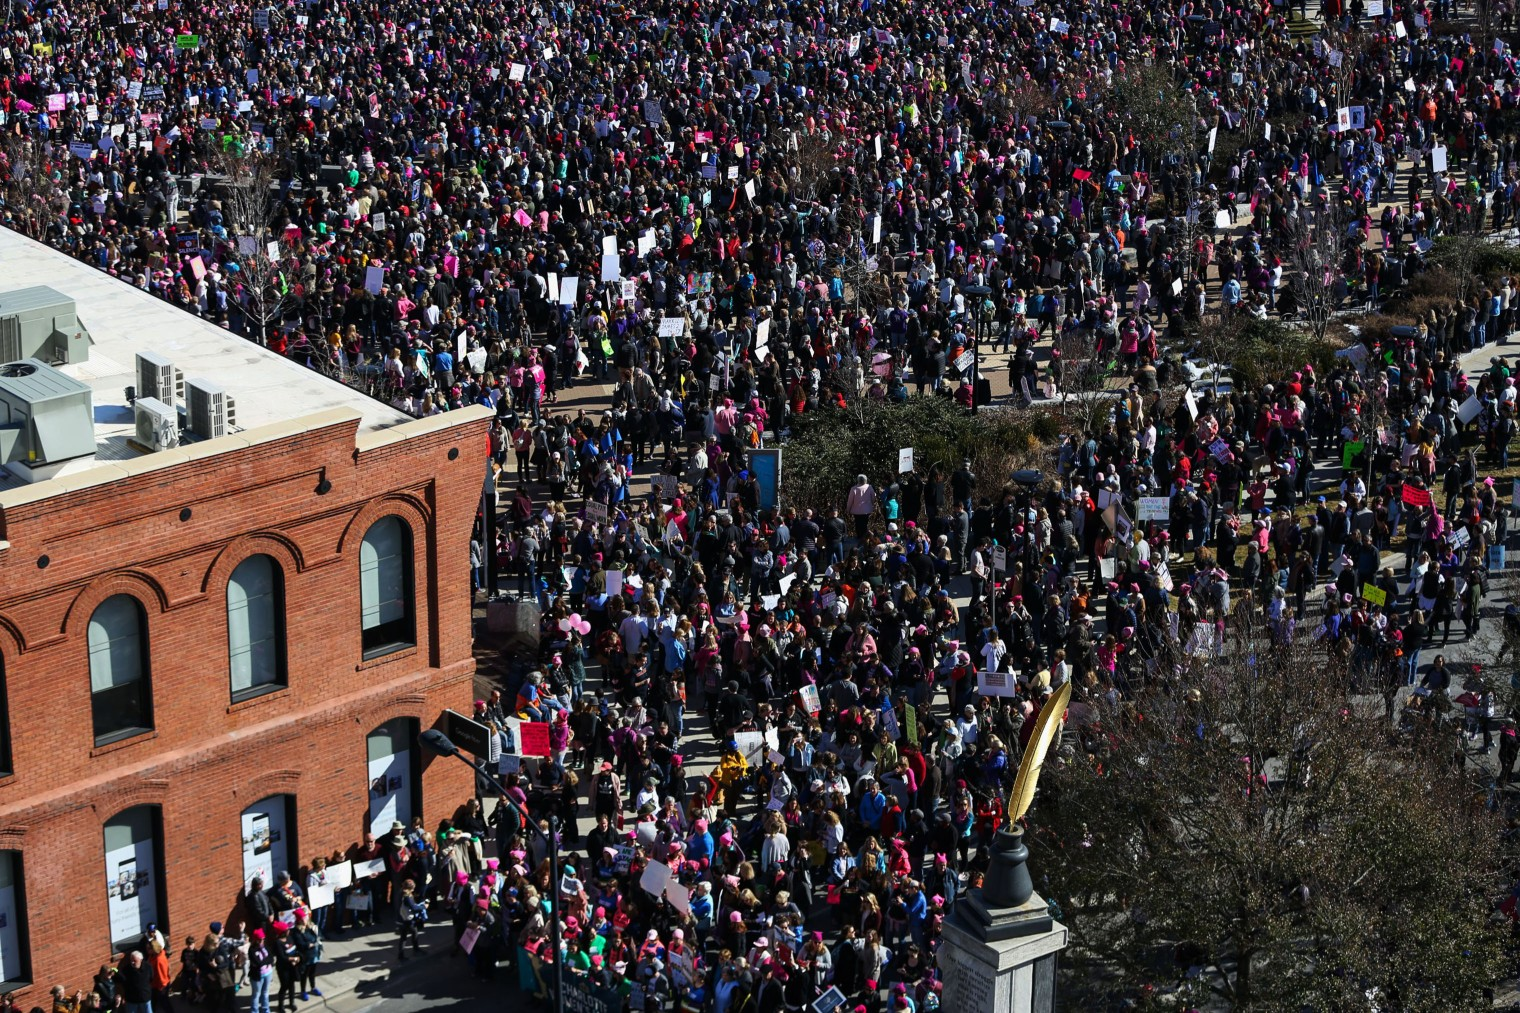 woemns-march-2018-washington-dc-nyc-las-vegas